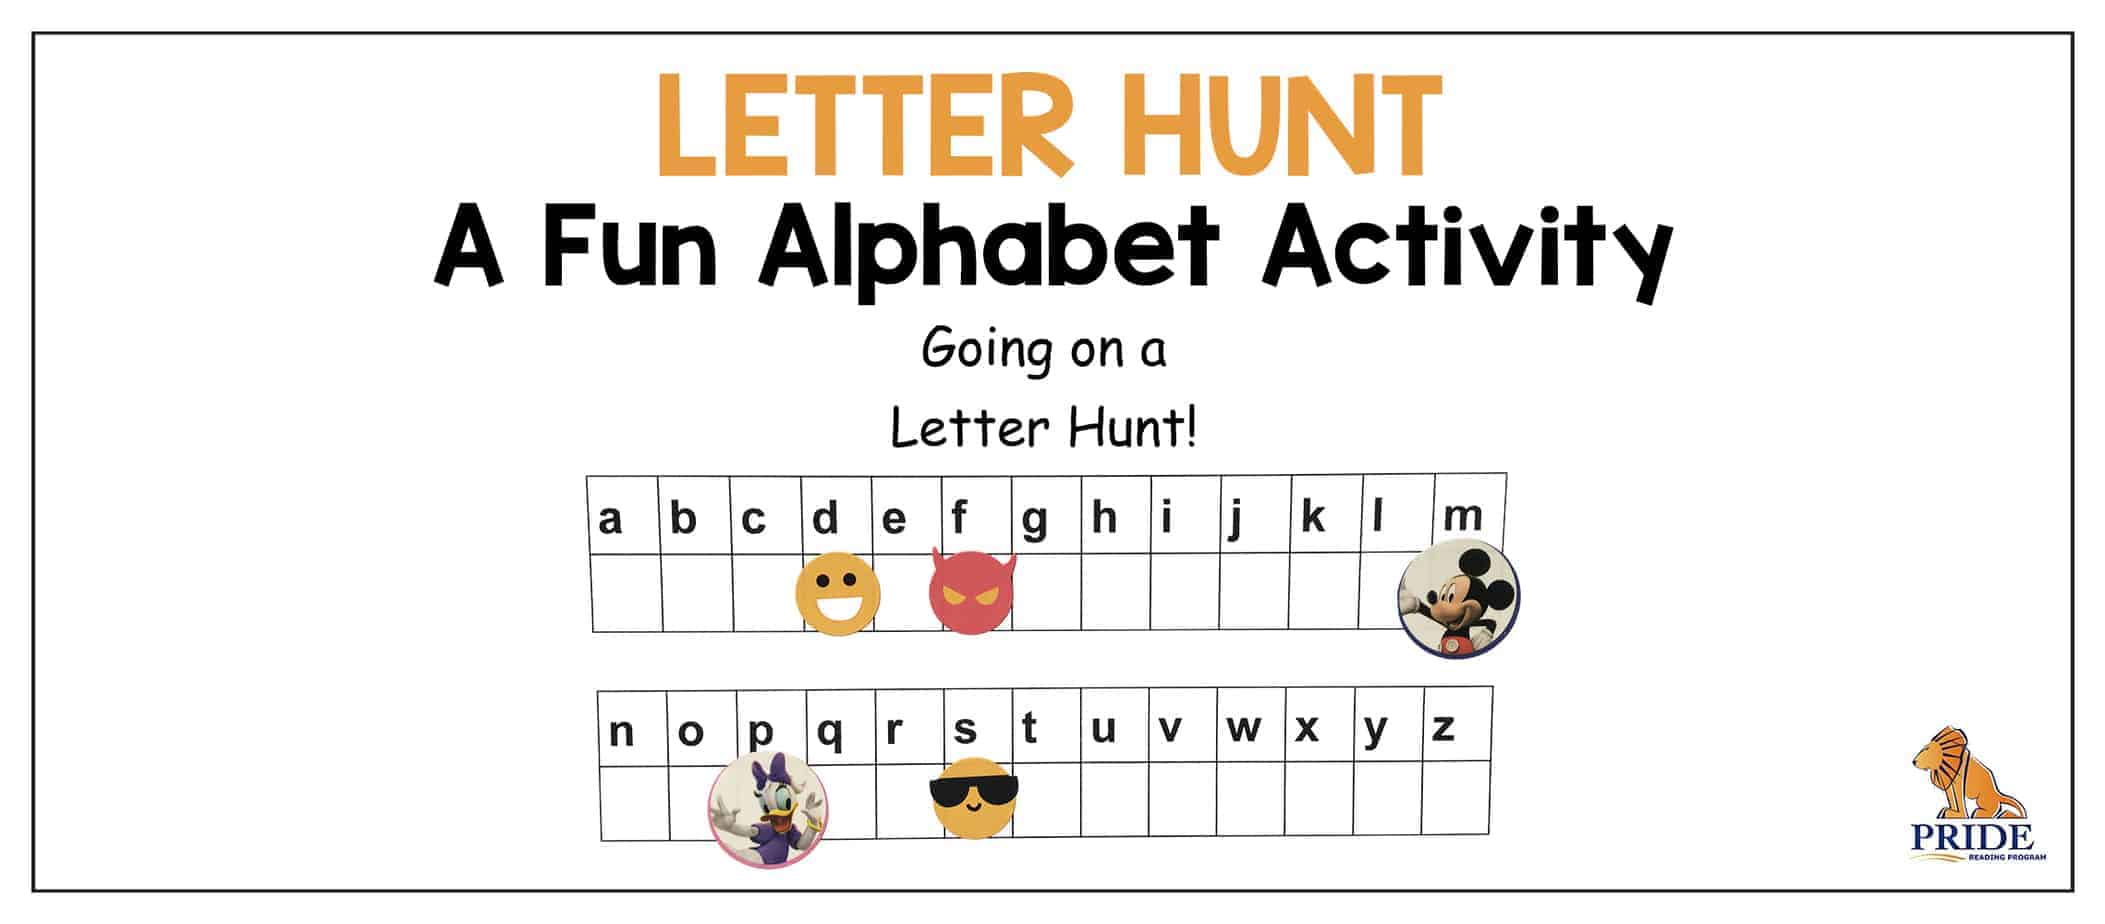 Letter Hunt A Fun Alphabet Activity